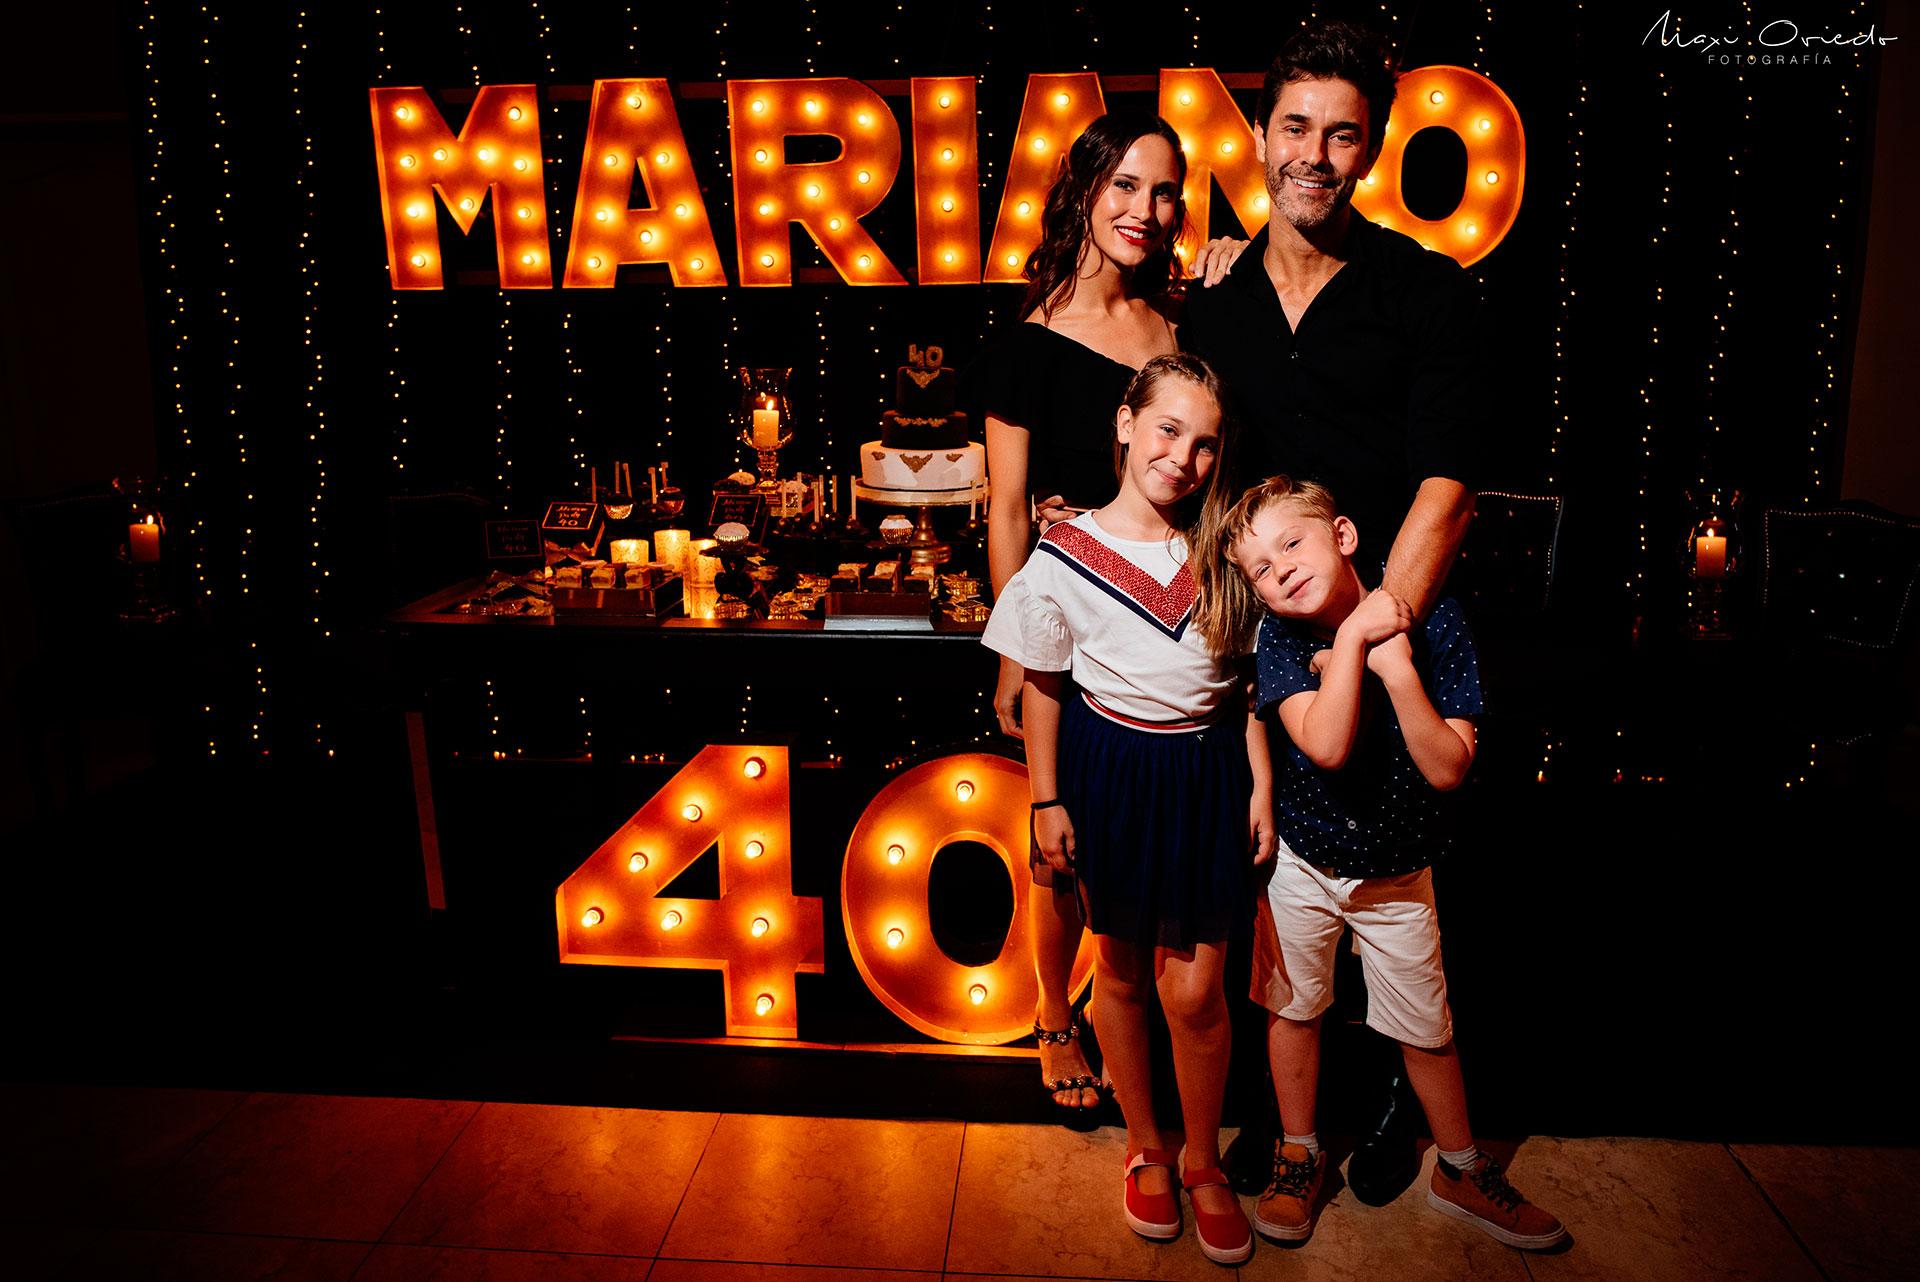 Mariano con Olivia (9) y Milo (5) (de su matrimonio con la modelo Juliana Giambroni) y Camila Cavallo (23), su novia.